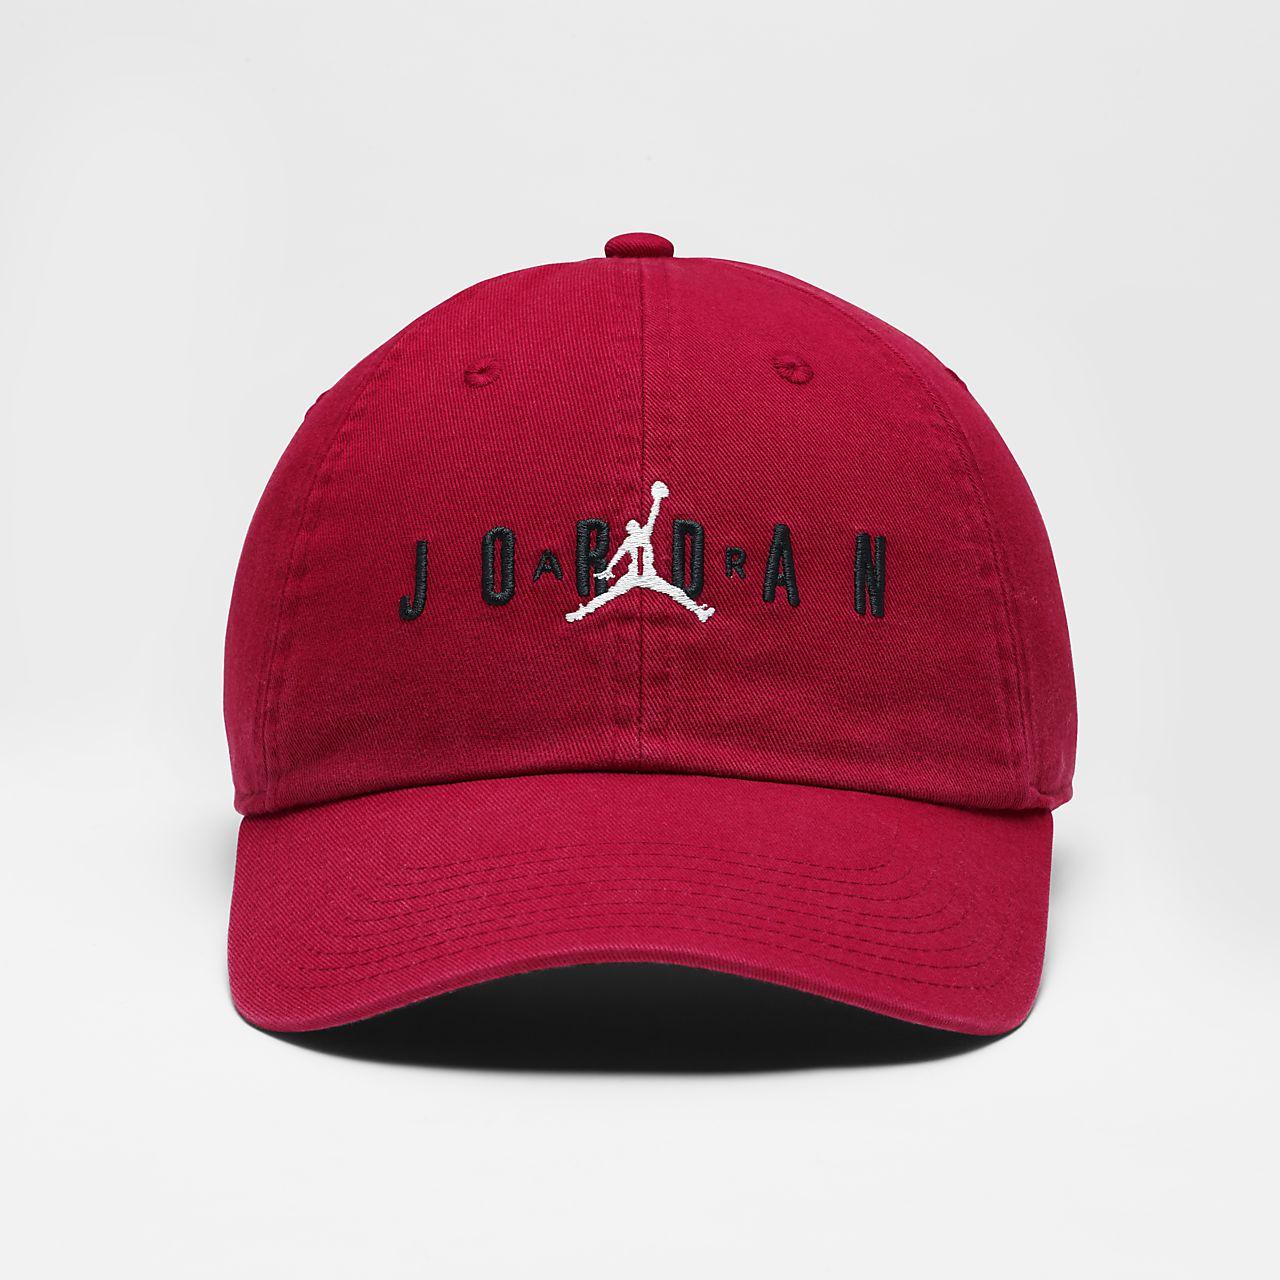 20b28e82938 Jordan Heritage 86 Jumpman Air Adjustable Hat. Nike.com